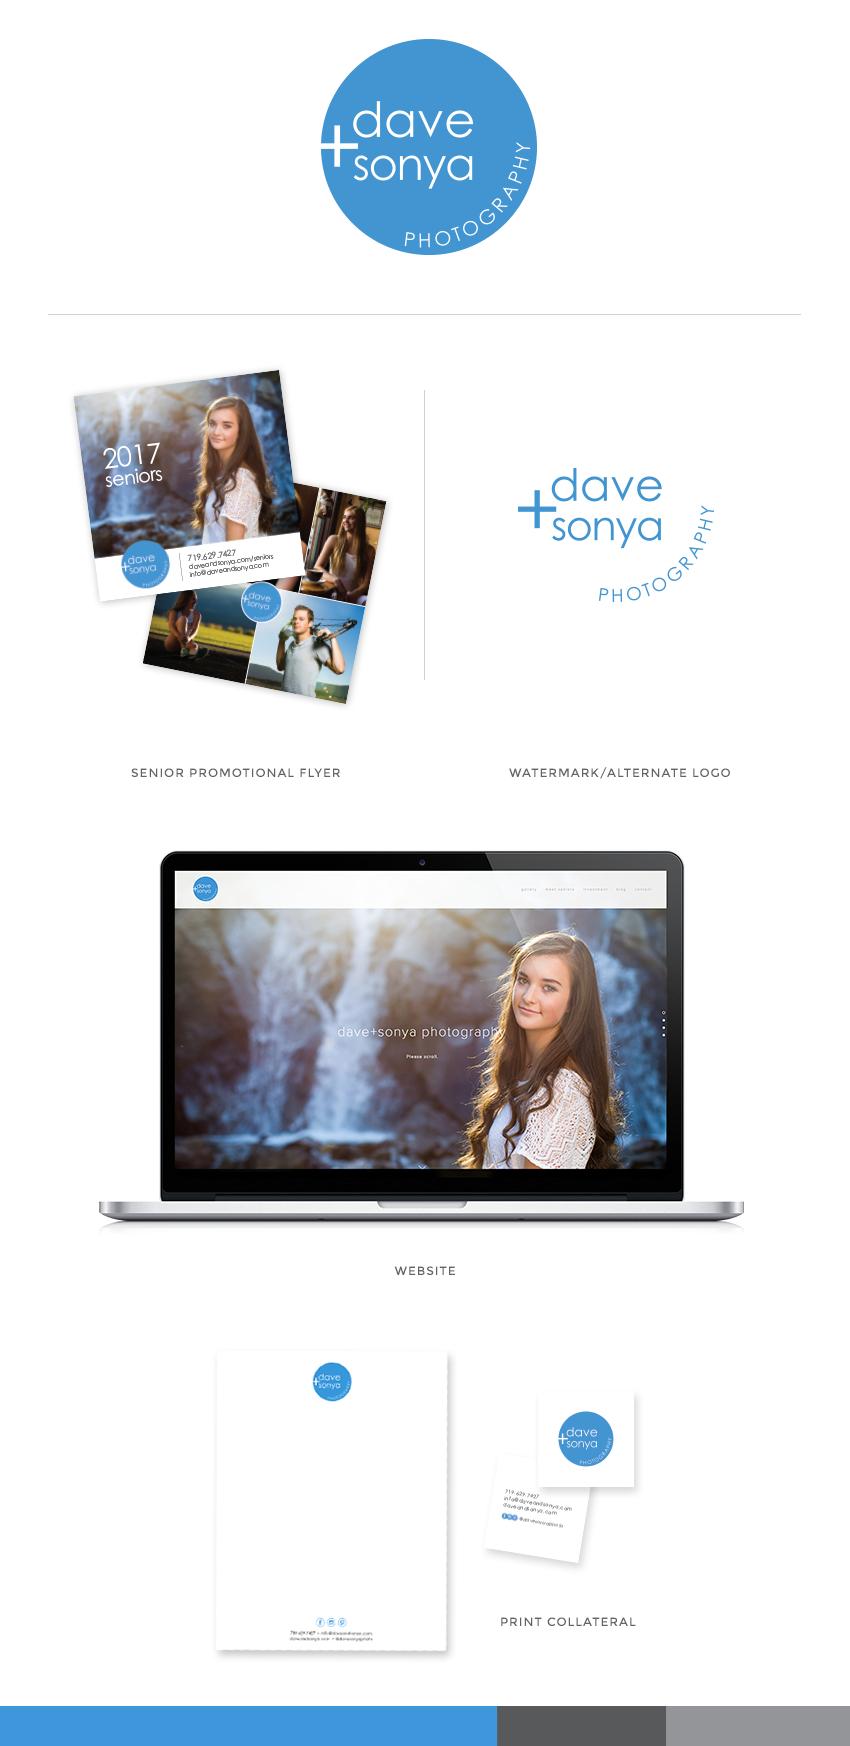 Colorado Springs photographer logo and brand design. Senior portrait photographer, Dave + Sonya Photography.